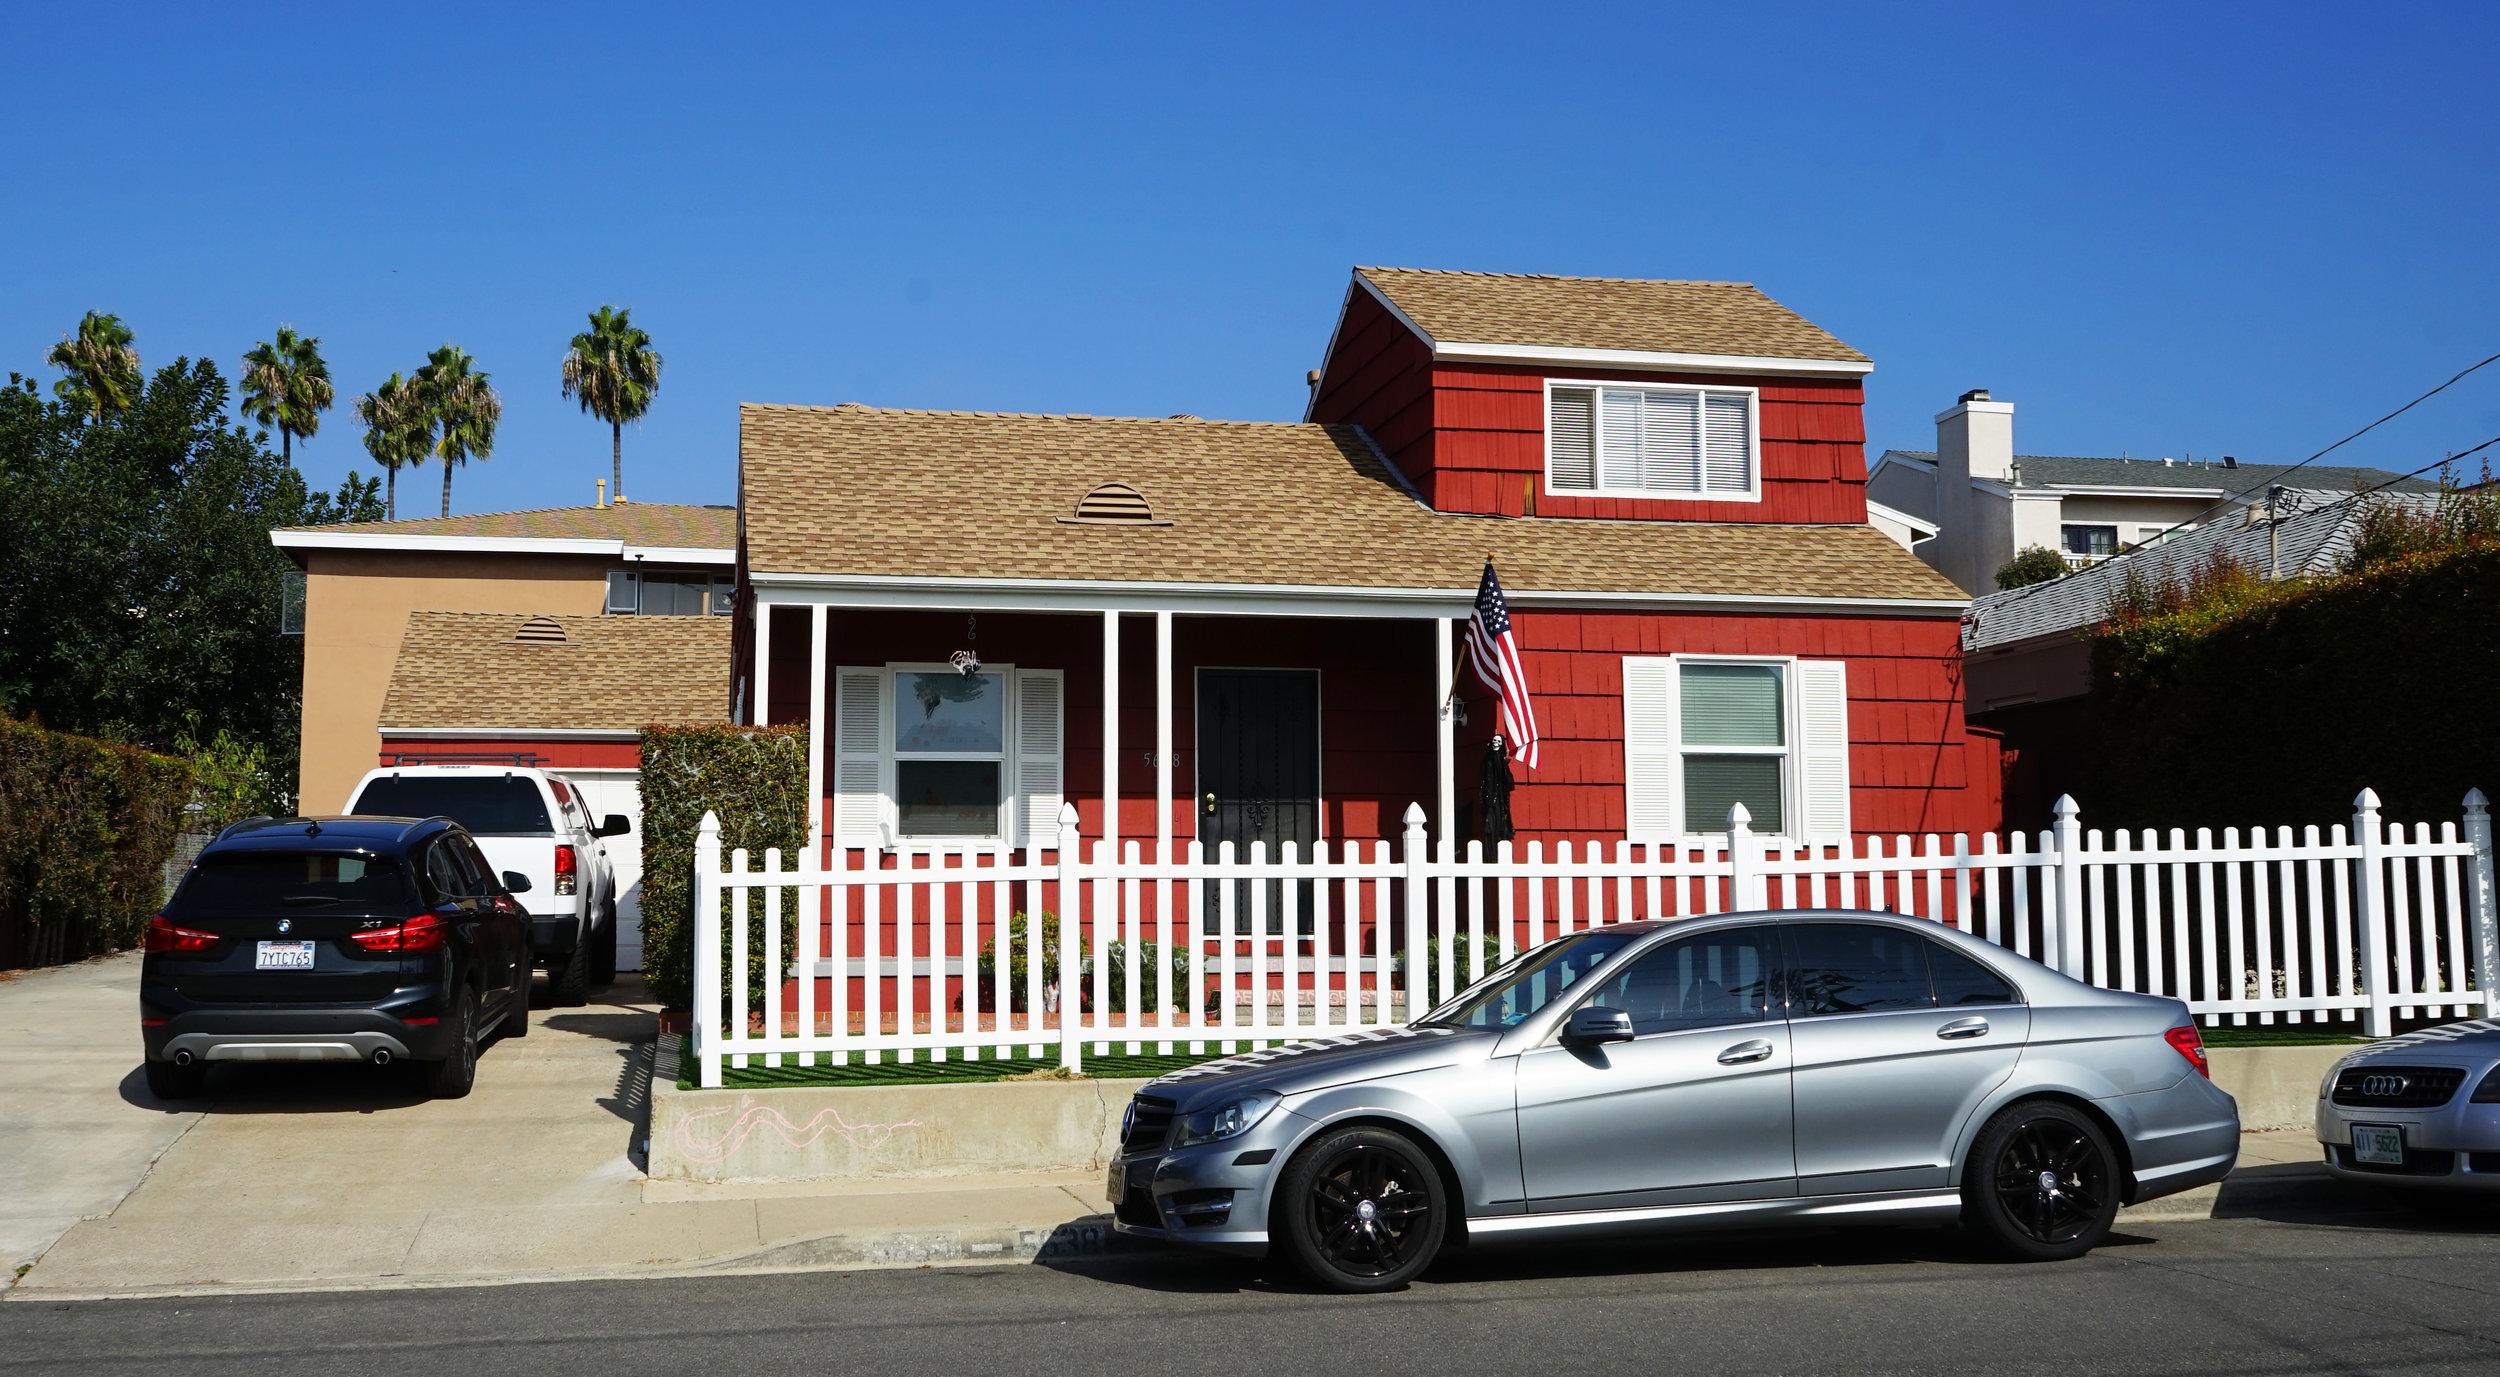 5630 Gaines Street - Morena5 Units$1,350,000